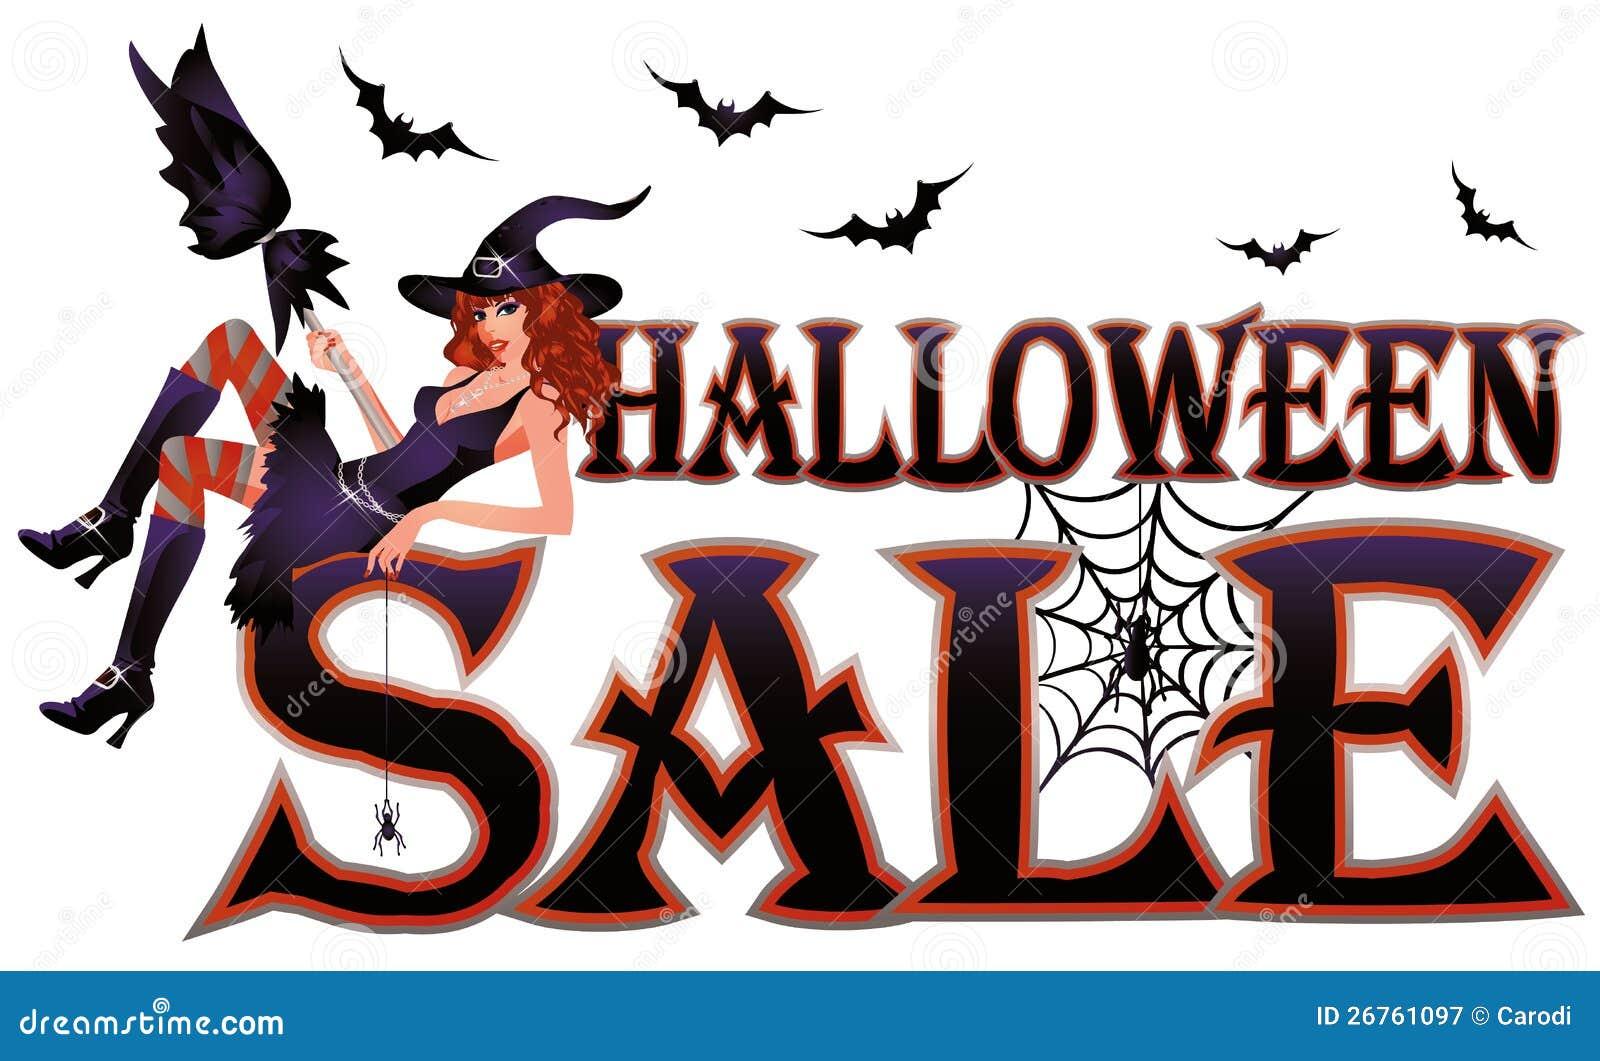 Halloween sale banner stock vector. Illustration of sale - 26761097